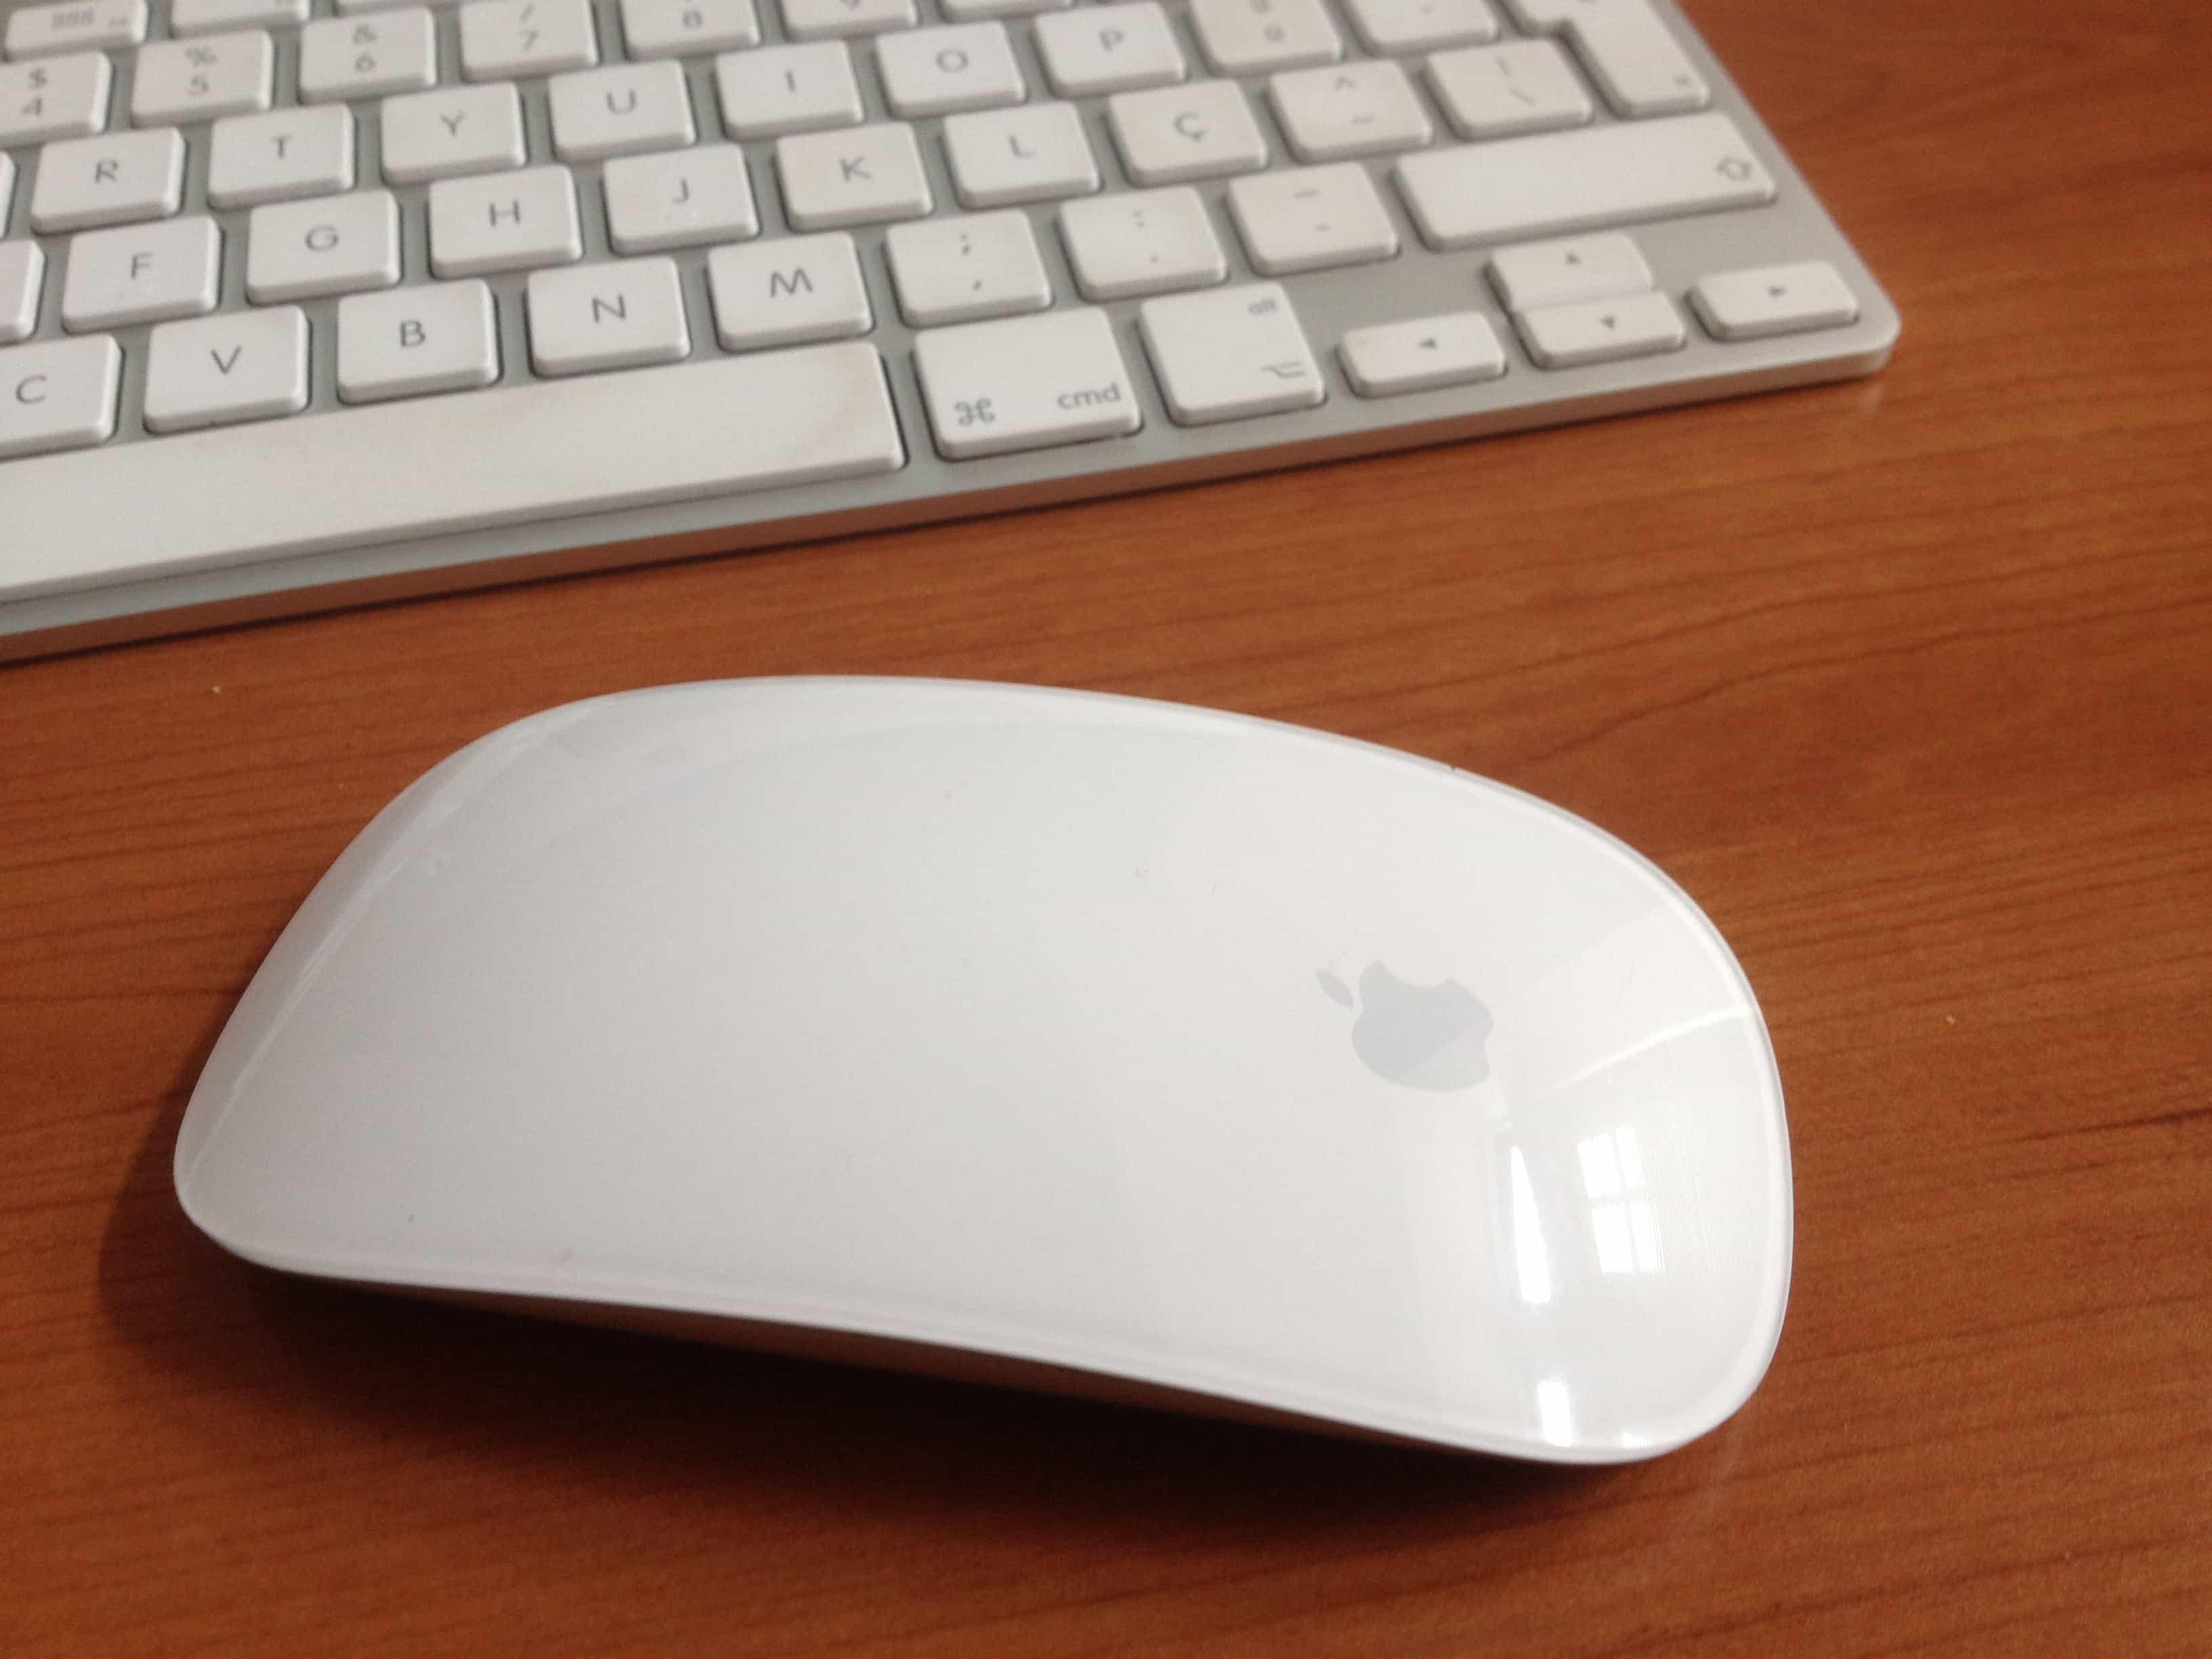 mouses para o Mac